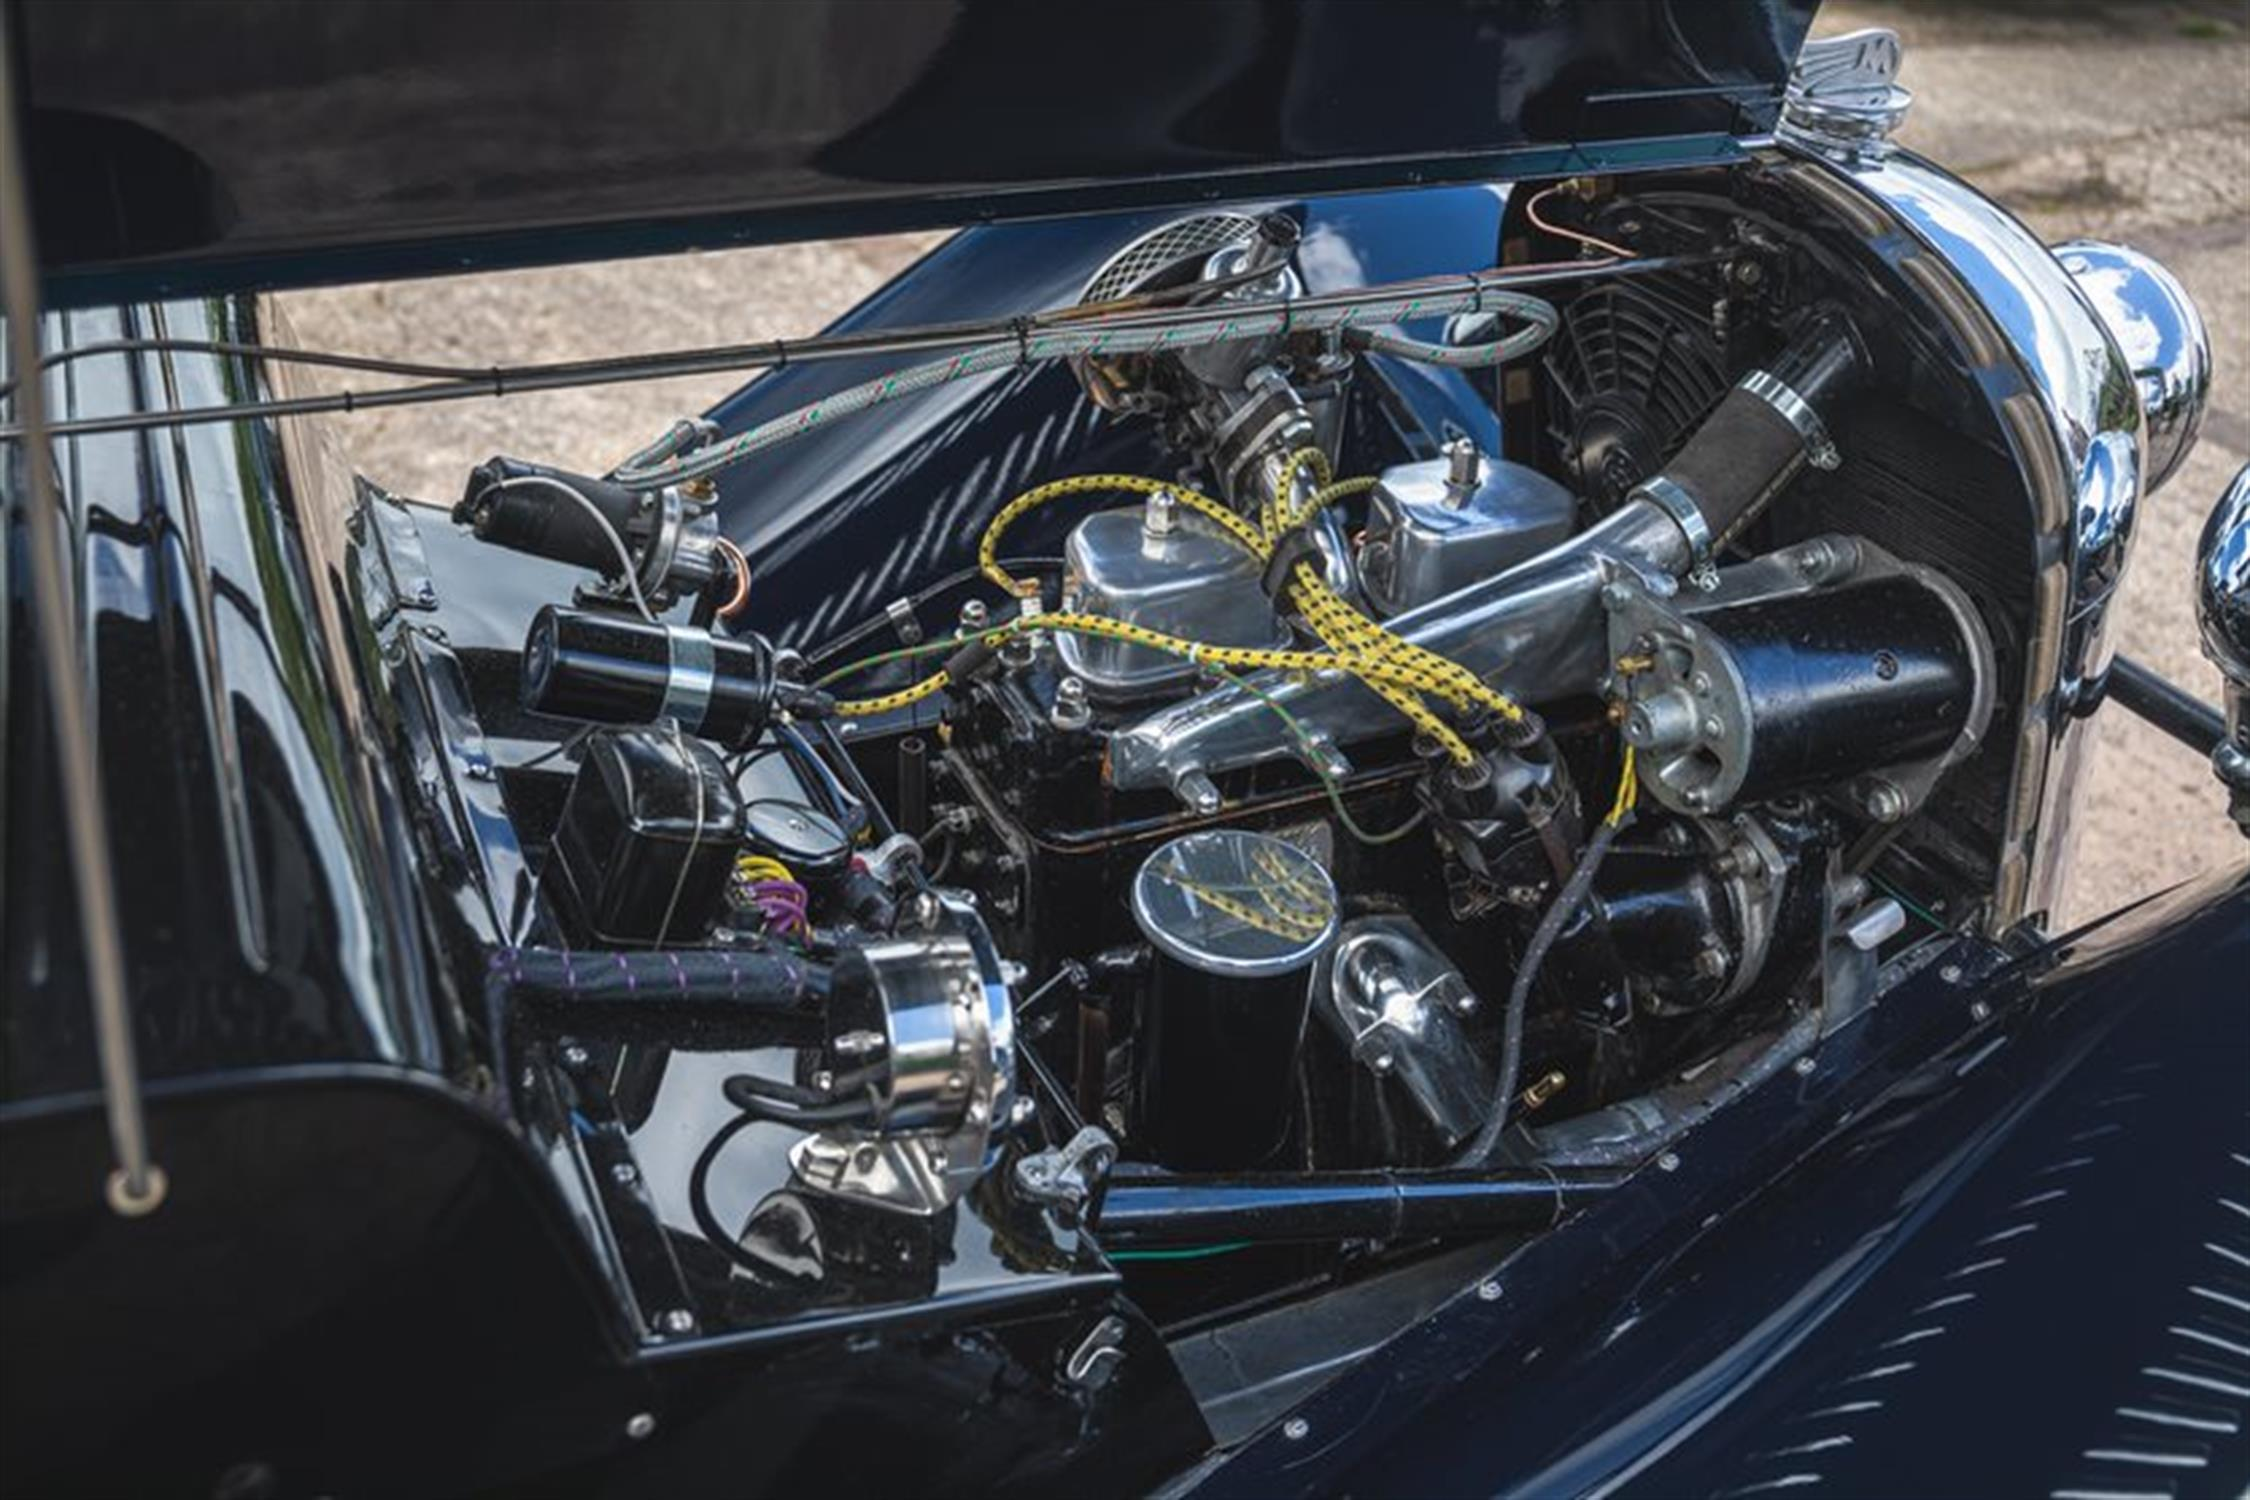 1939 Morgan 4/4 Series 1 'Flat Rad' (1098cc Climax Engine) - Image 4 of 10